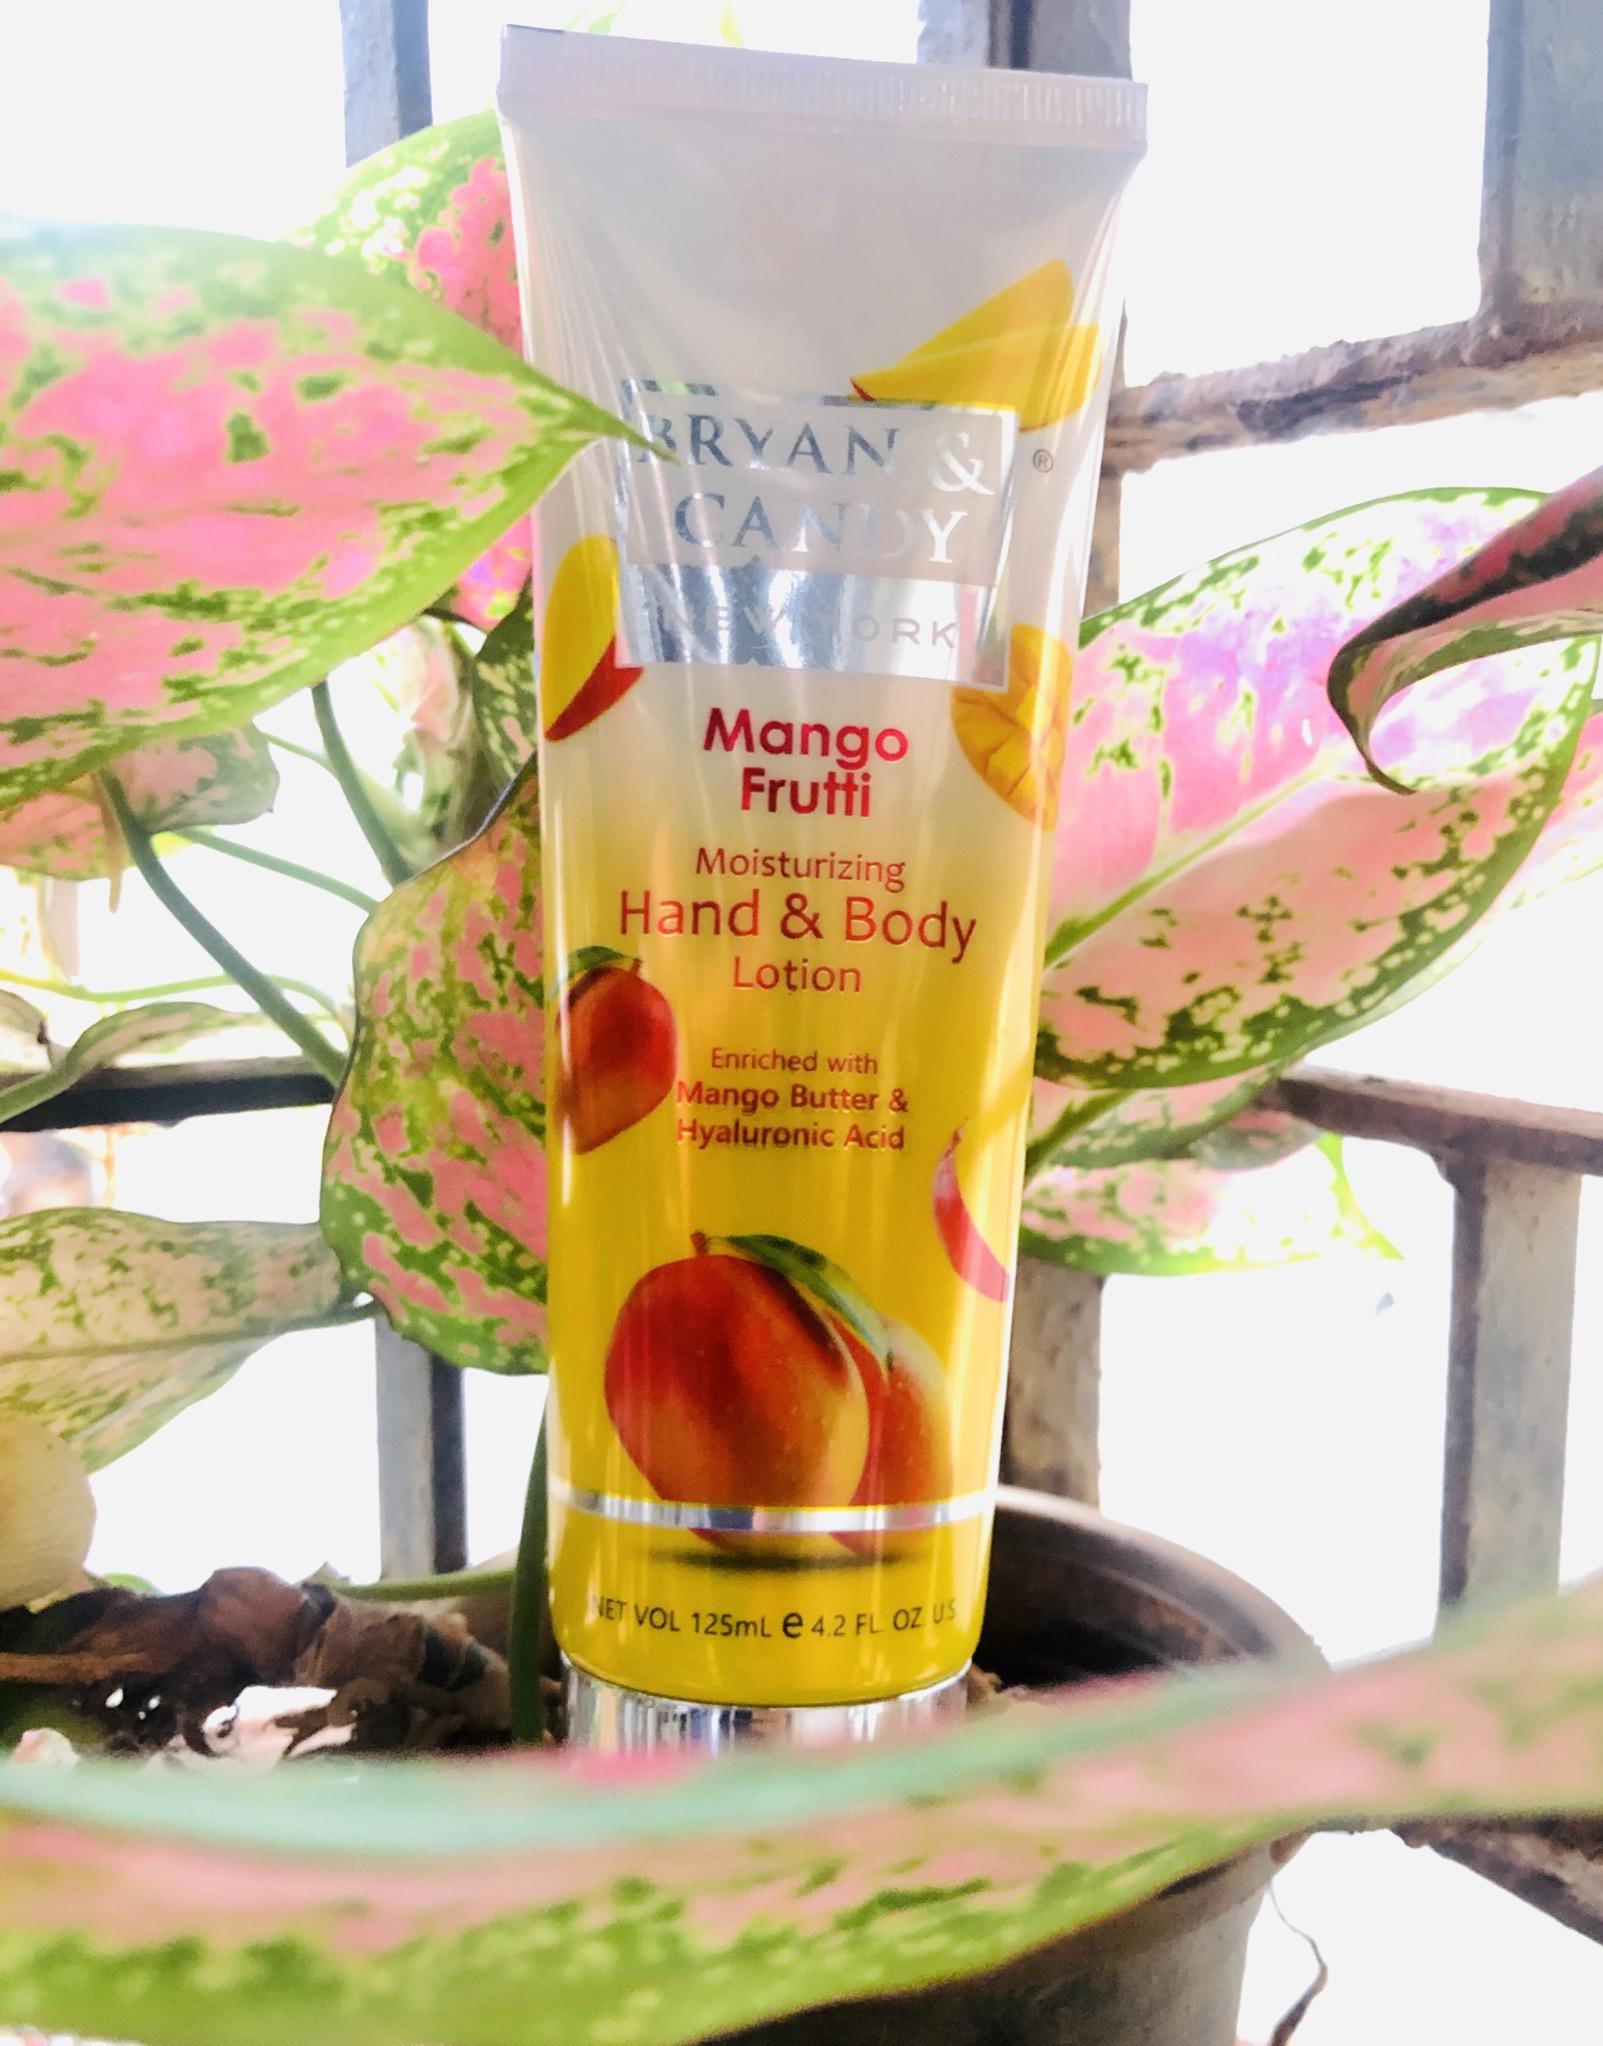 Bryan & Candy New York Mango Frutti Hand and Body Lotion-Mango Bliss-By poojakj